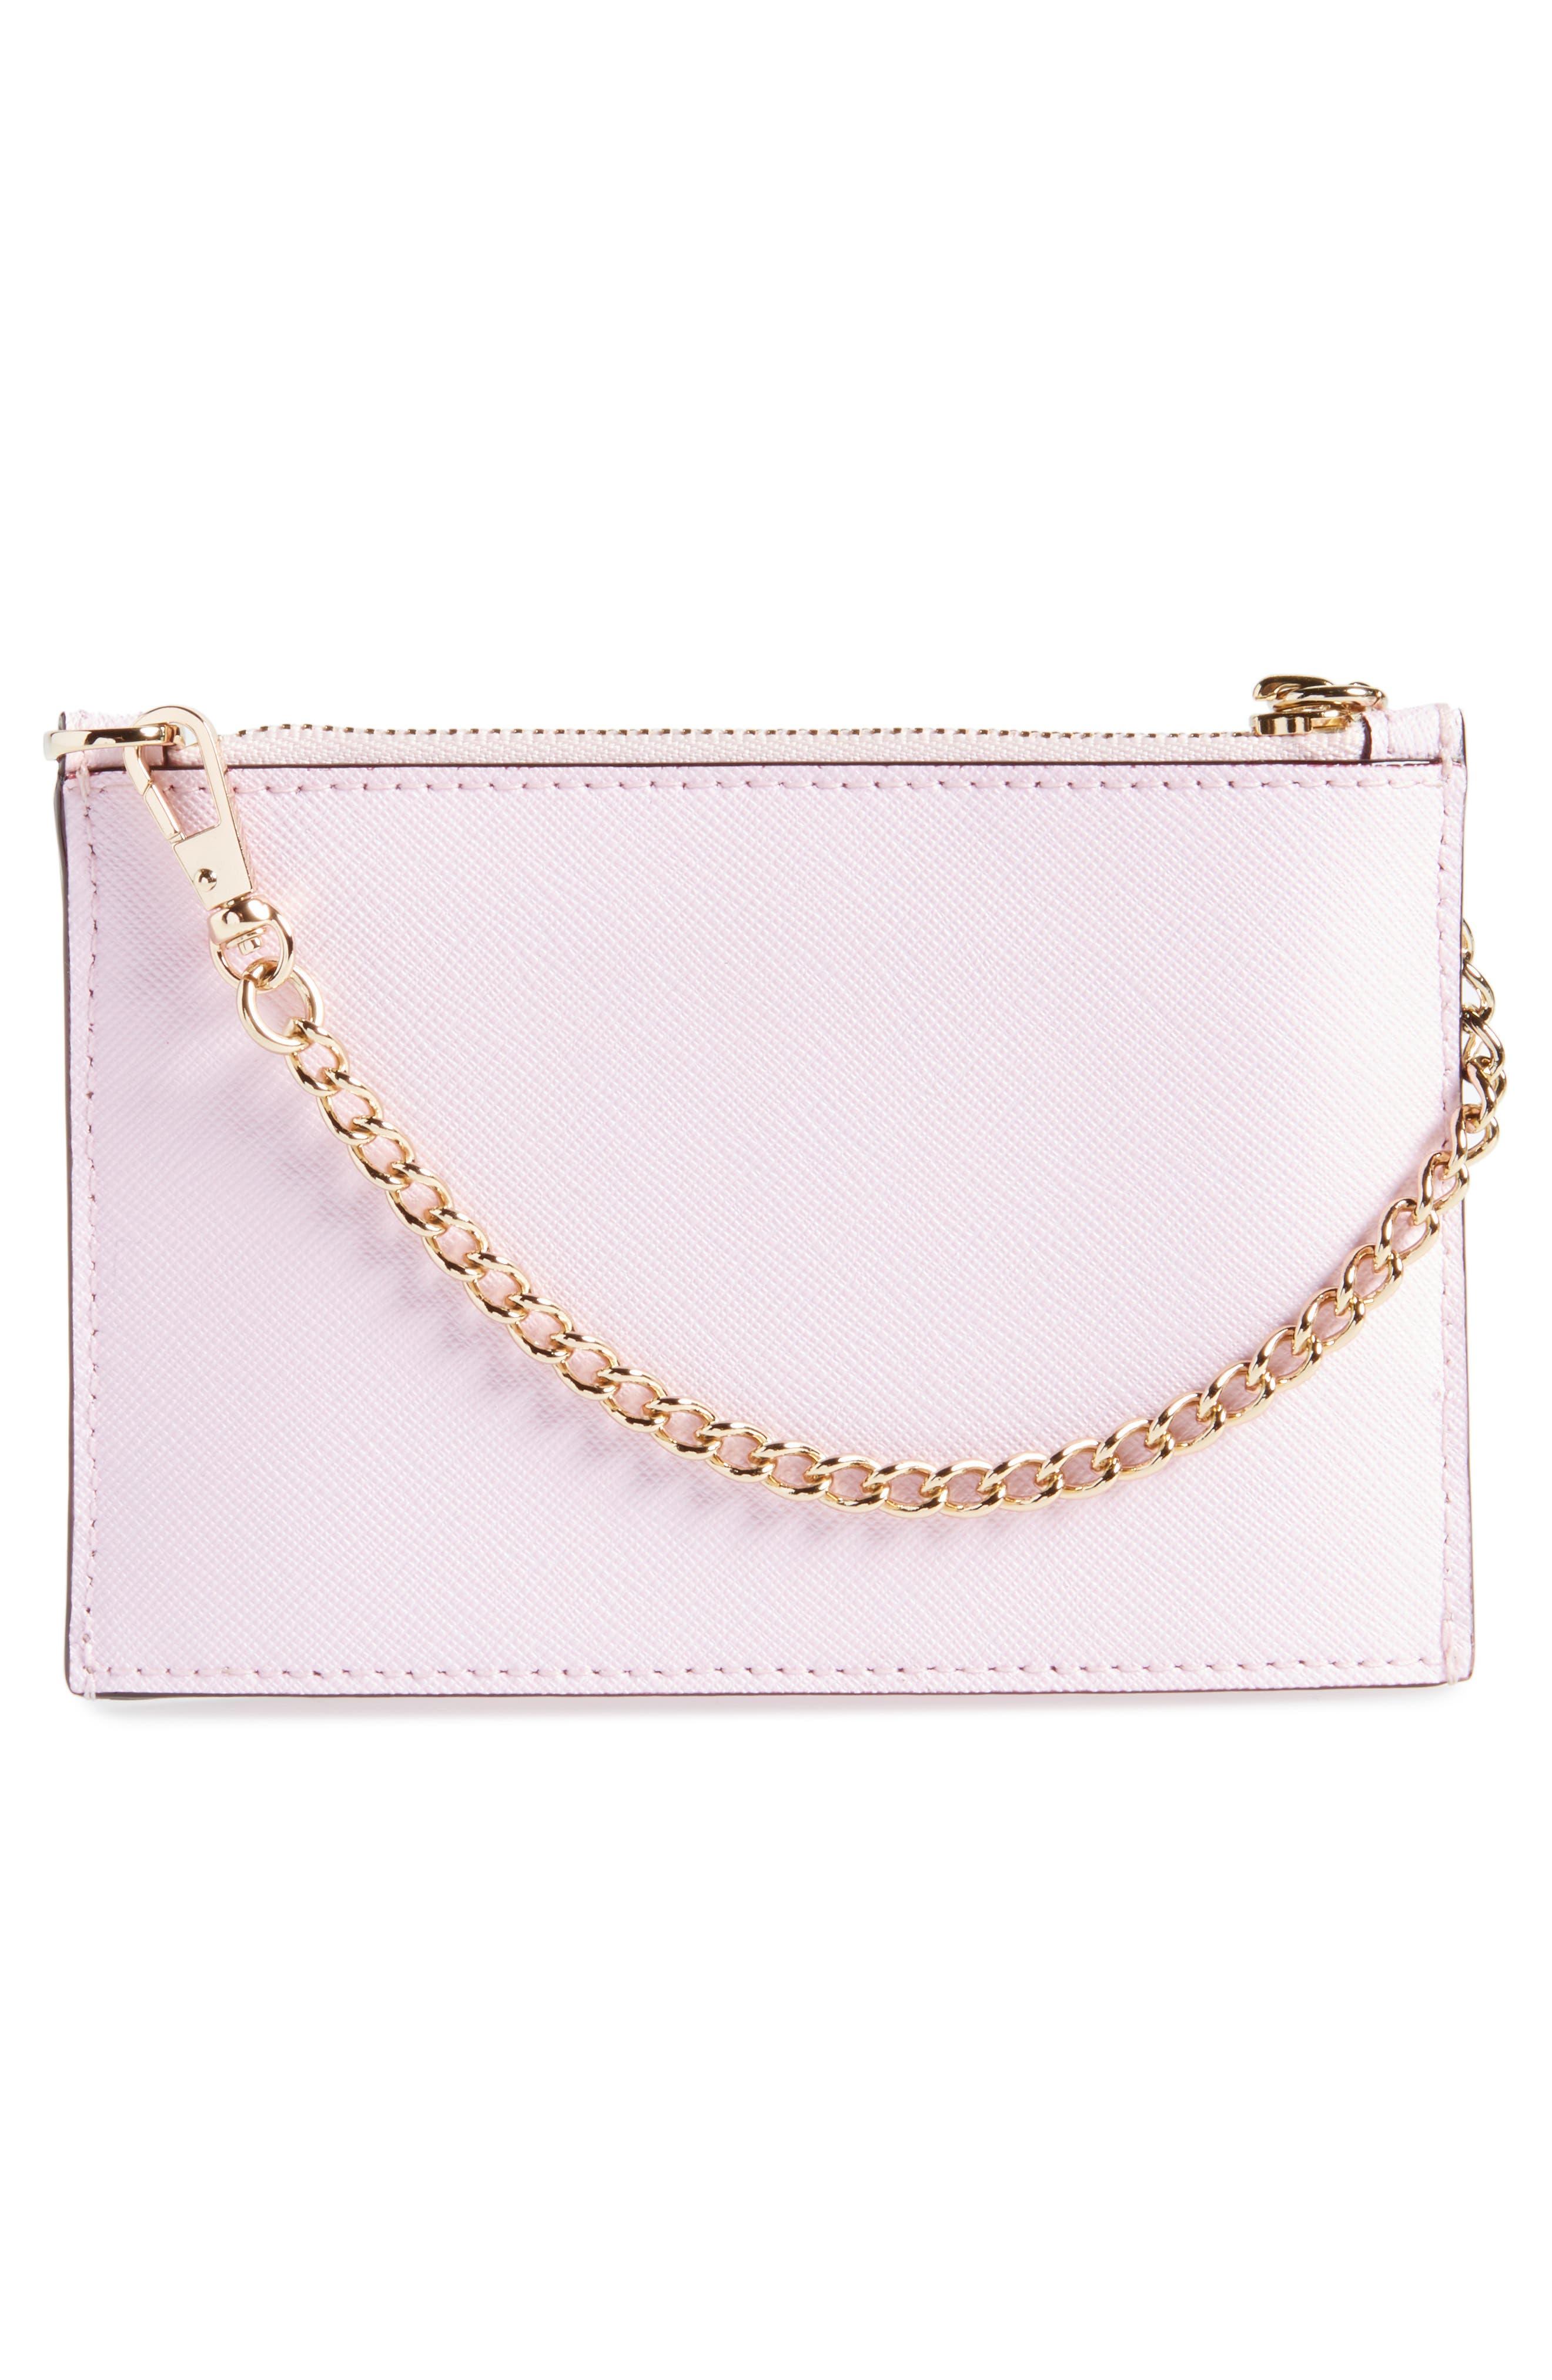 cameron street caroline leather zip pouch,                             Alternate thumbnail 3, color,                             Pink Lemonade